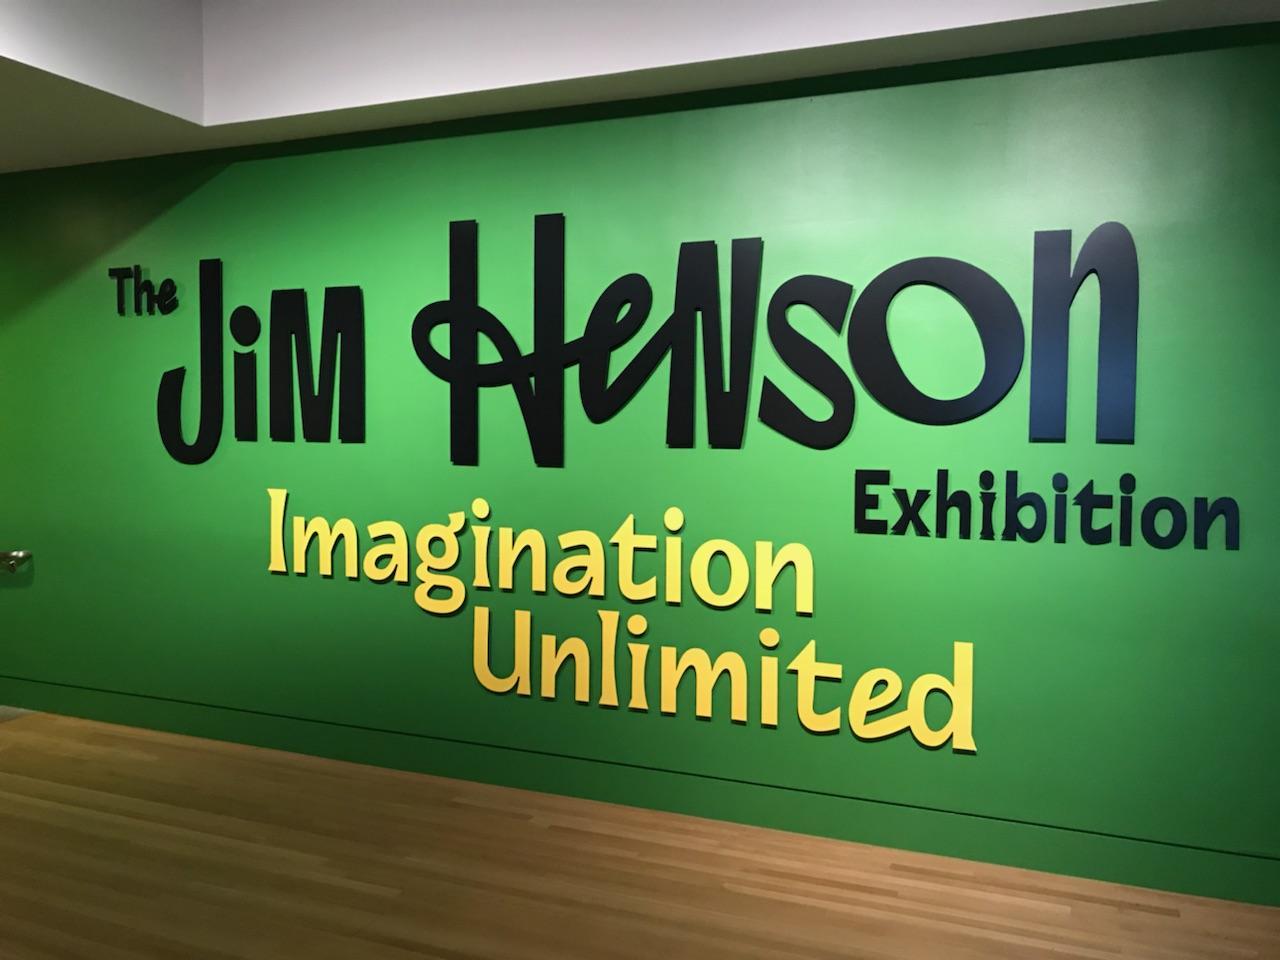 Henson1.jpeg